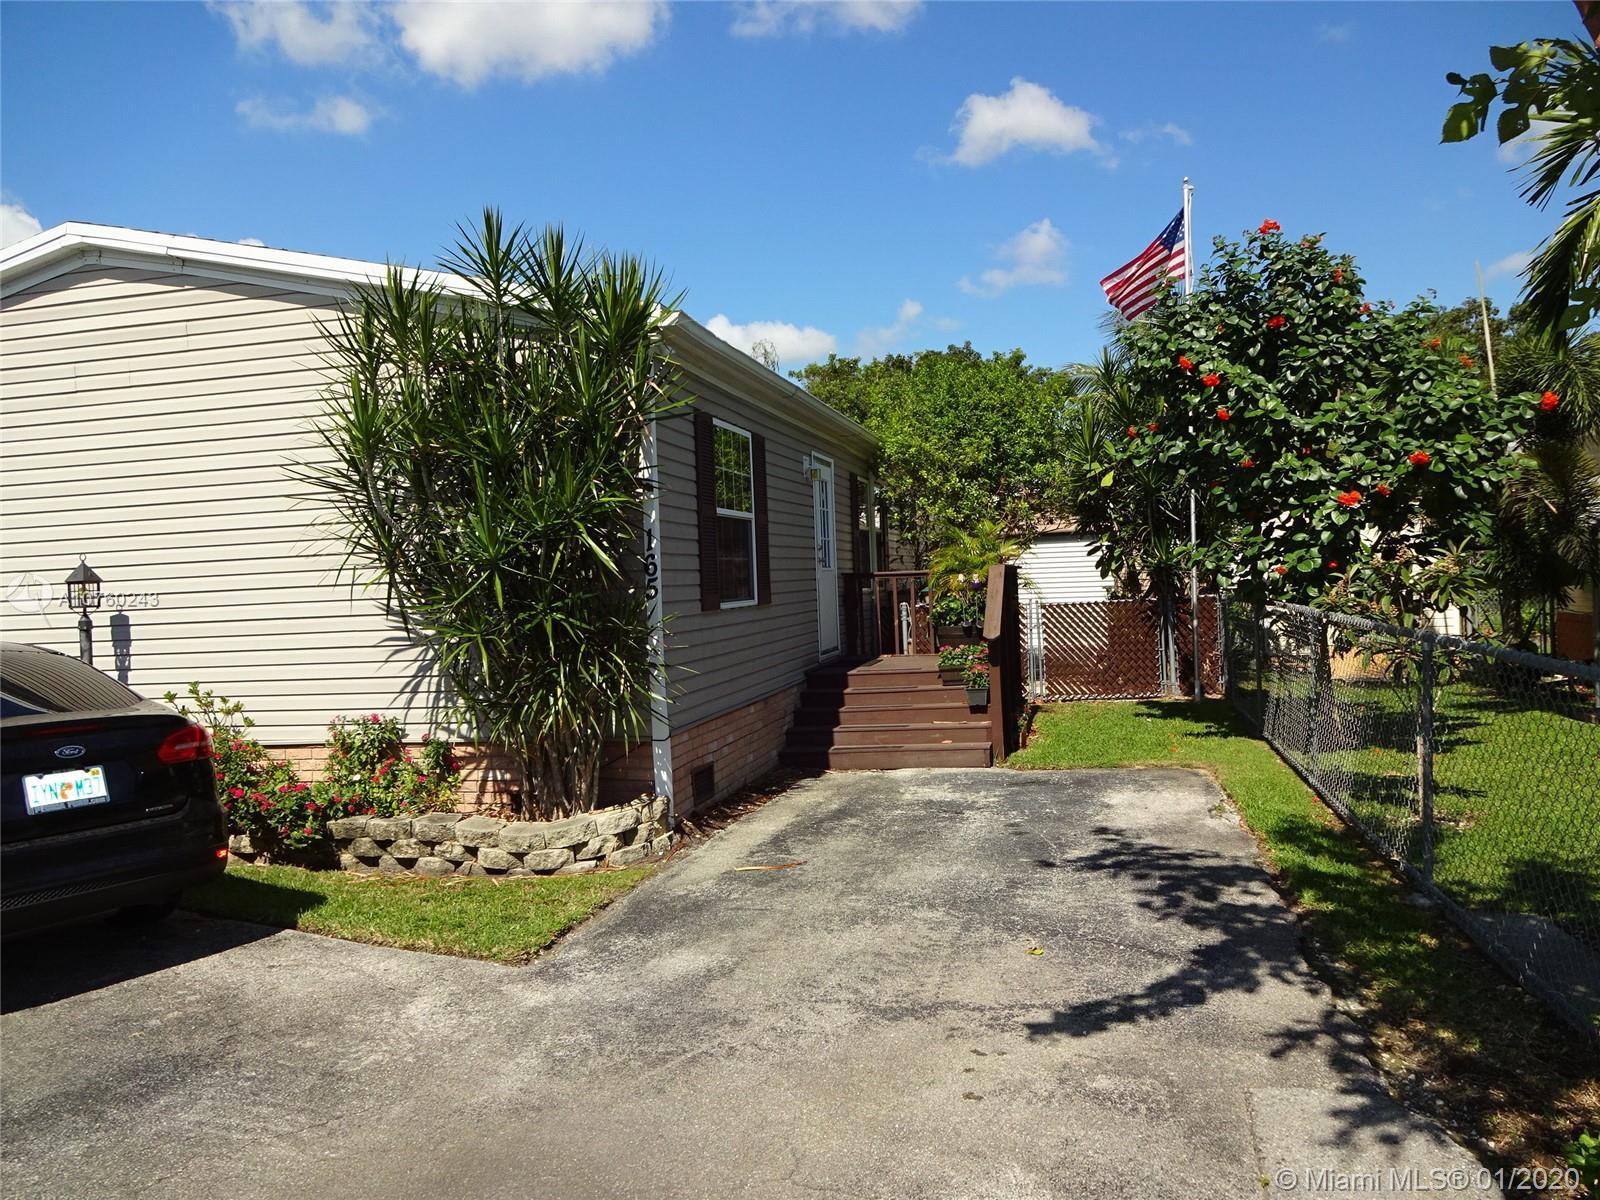 220 NE 12 Ave #165, Homestead, FL 33030 - Homestead, FL real estate listing